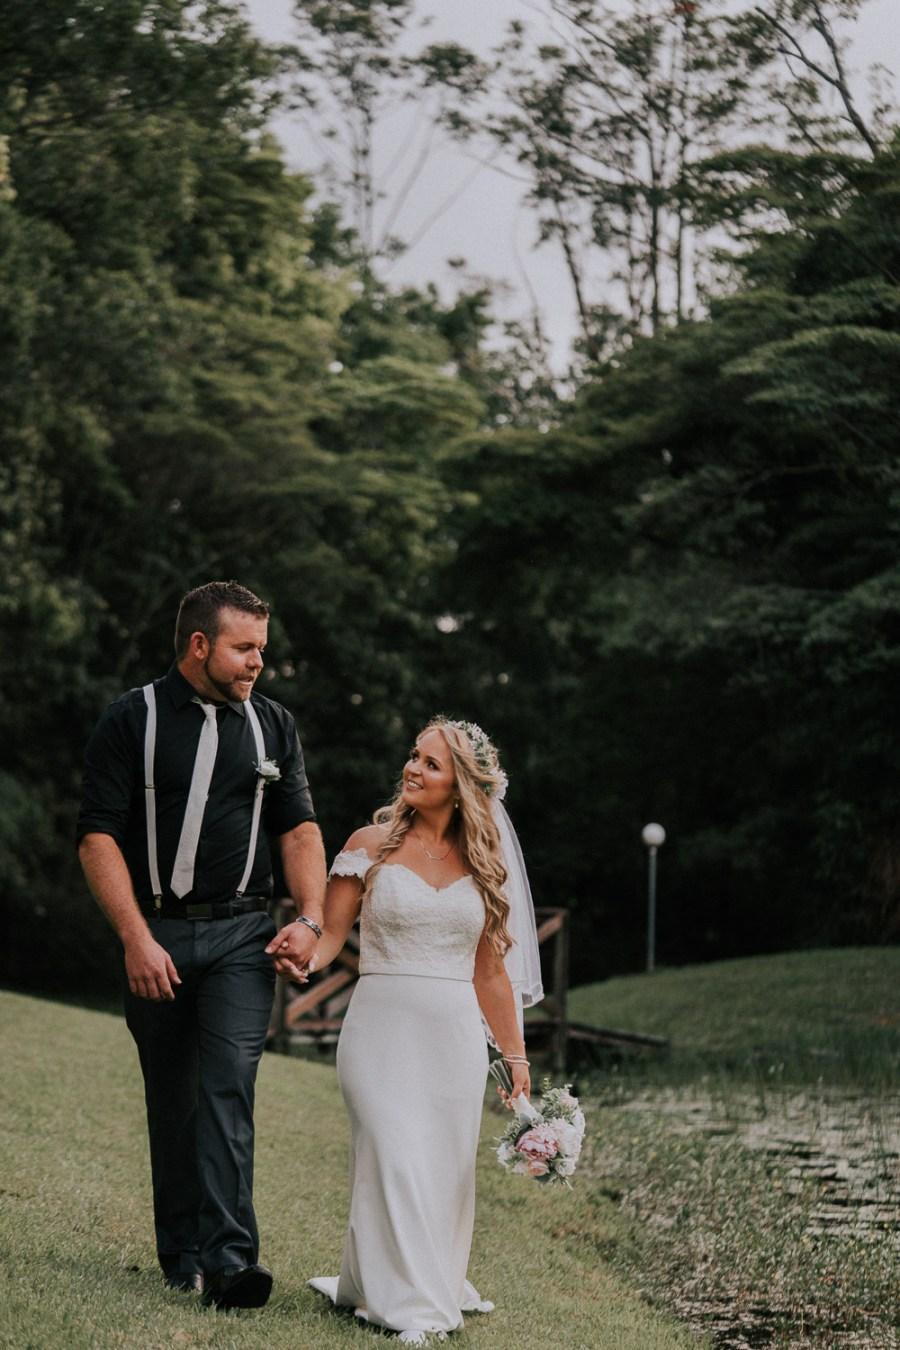 Keira-McCall-Sarah-Dan-_Brisbane_Wedding_Montville-Country-Cabins-BLOG_0019.jpg